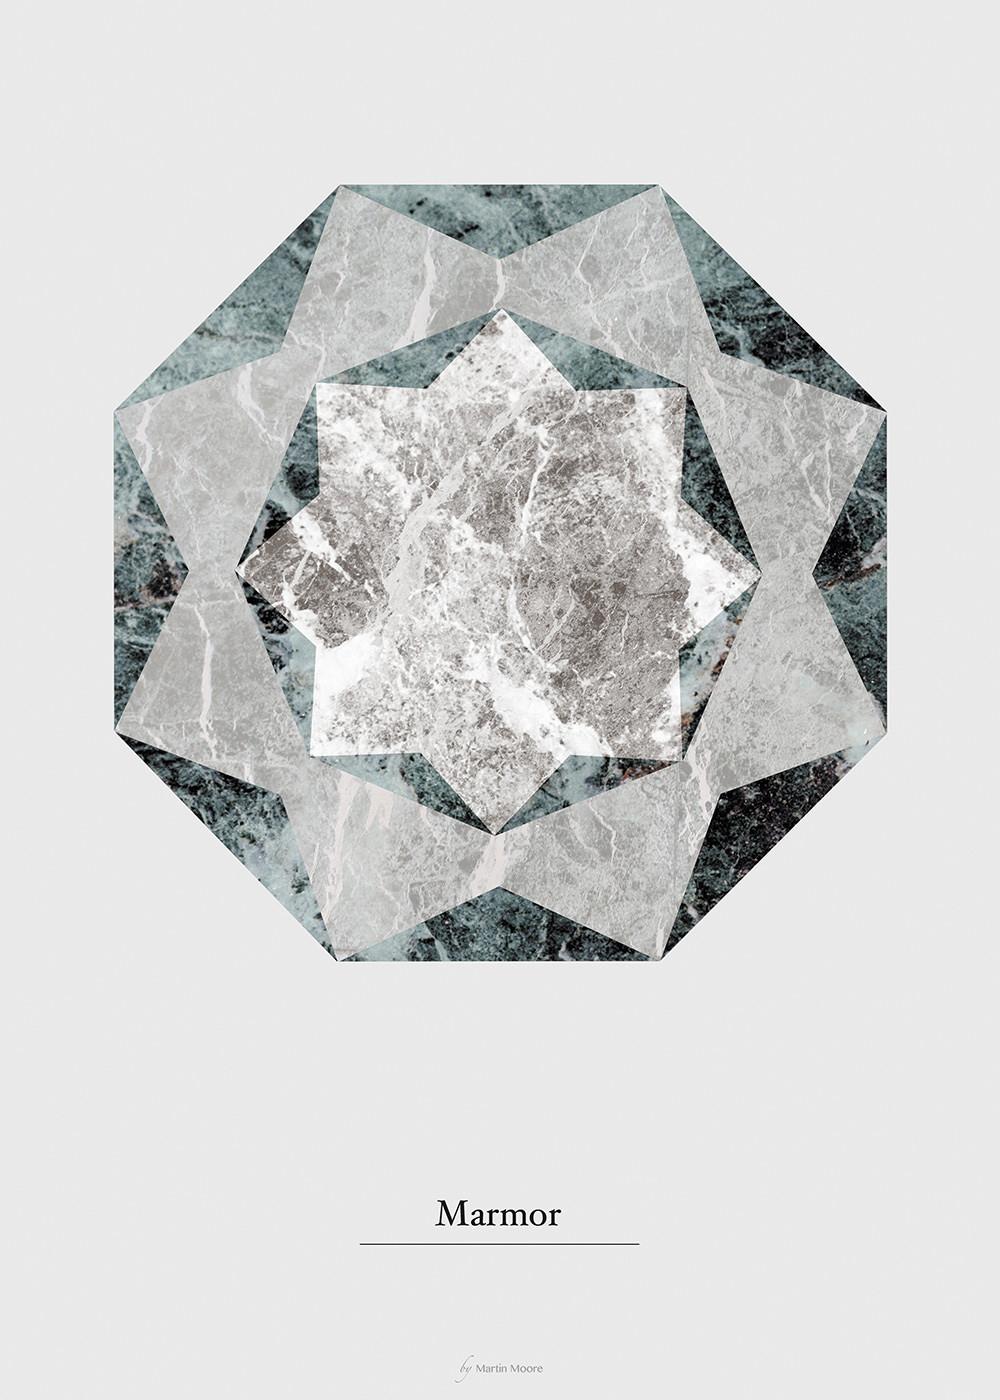 marmor_c68a0be8-e124-4857-b7e6-451db53a7daf.jpg